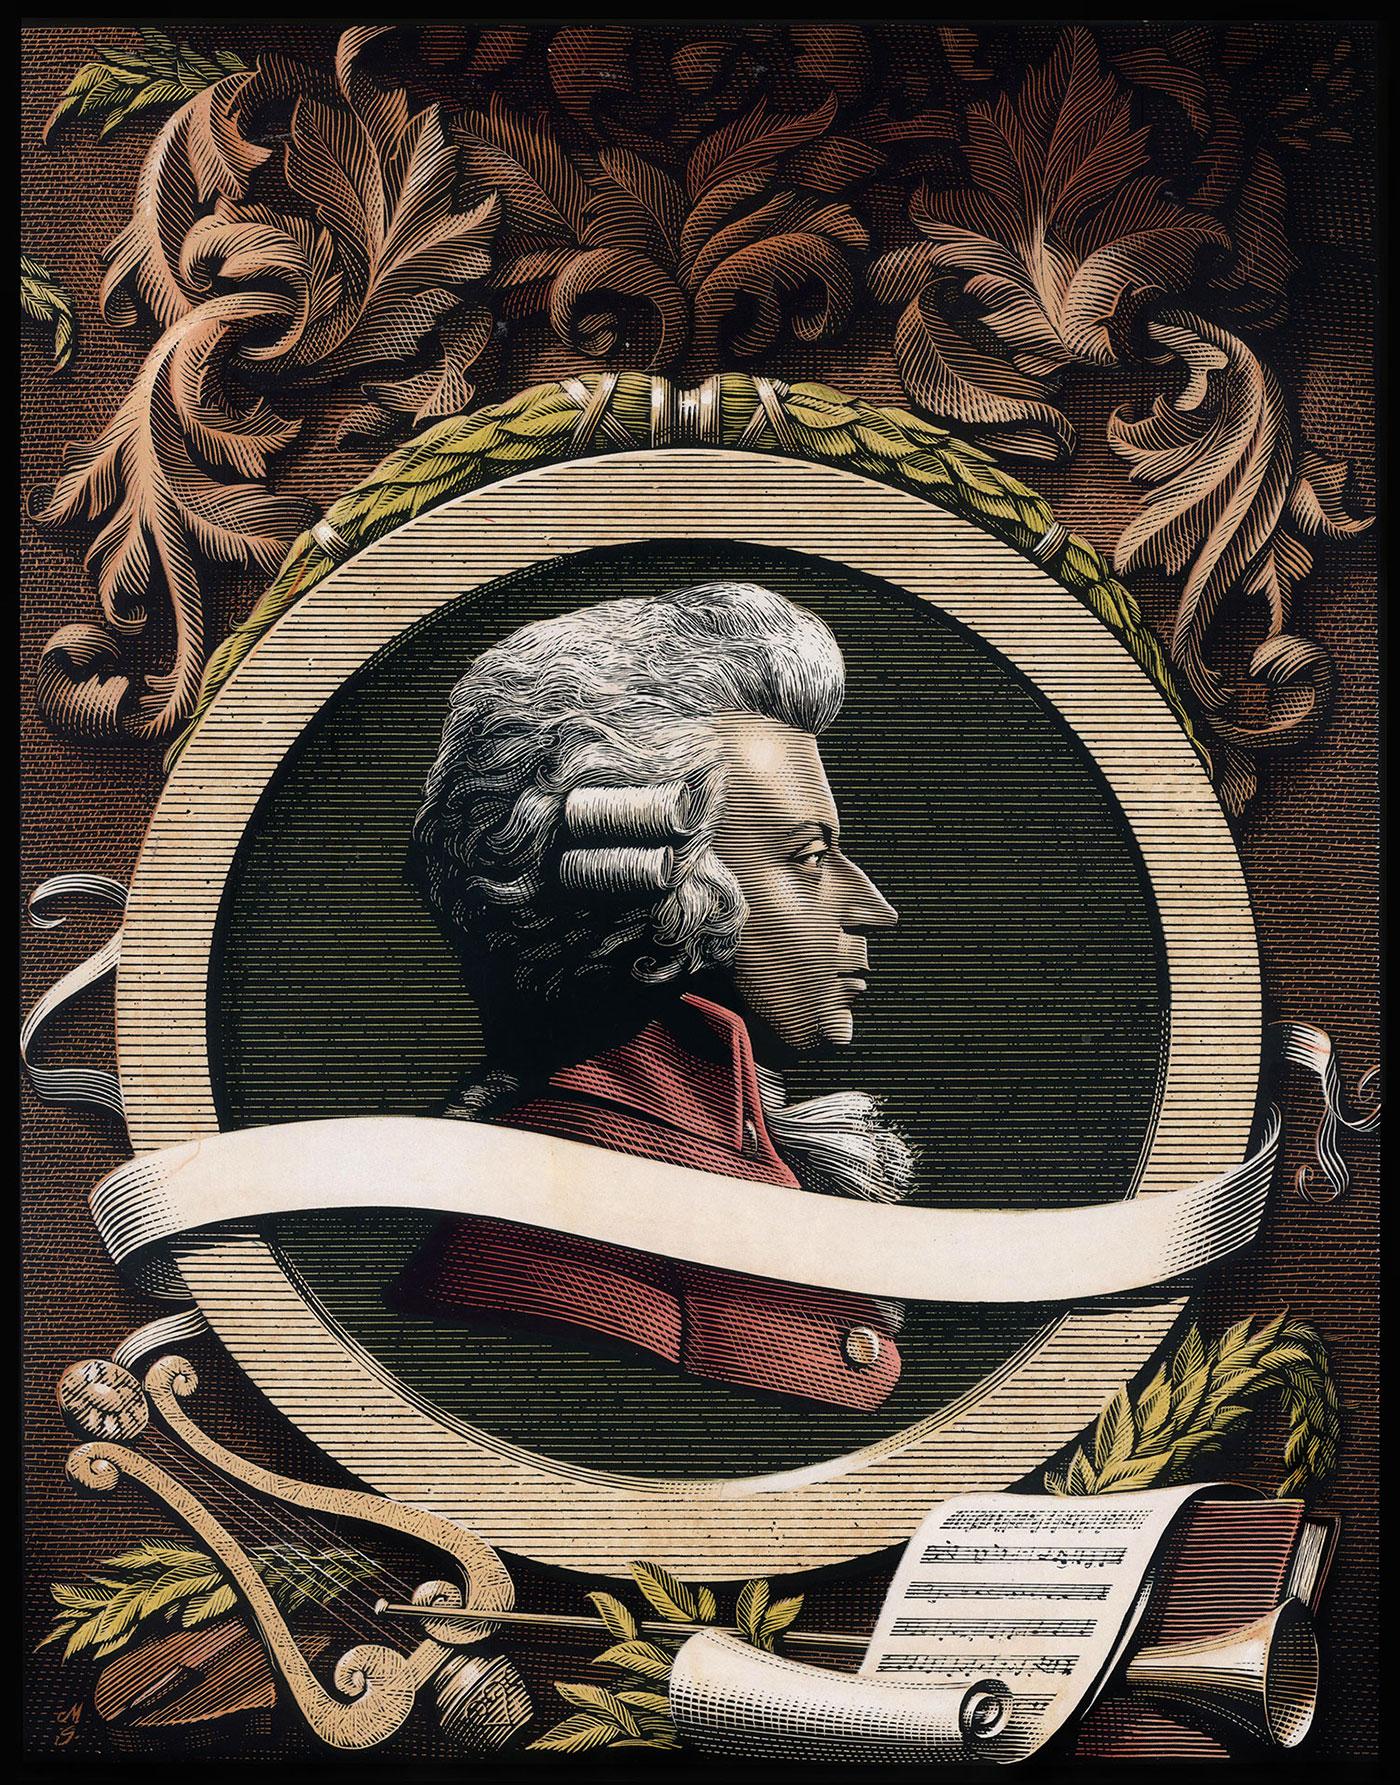 Richard Solomon - Mark-Summers-569-Time-Cover-Mozart-001